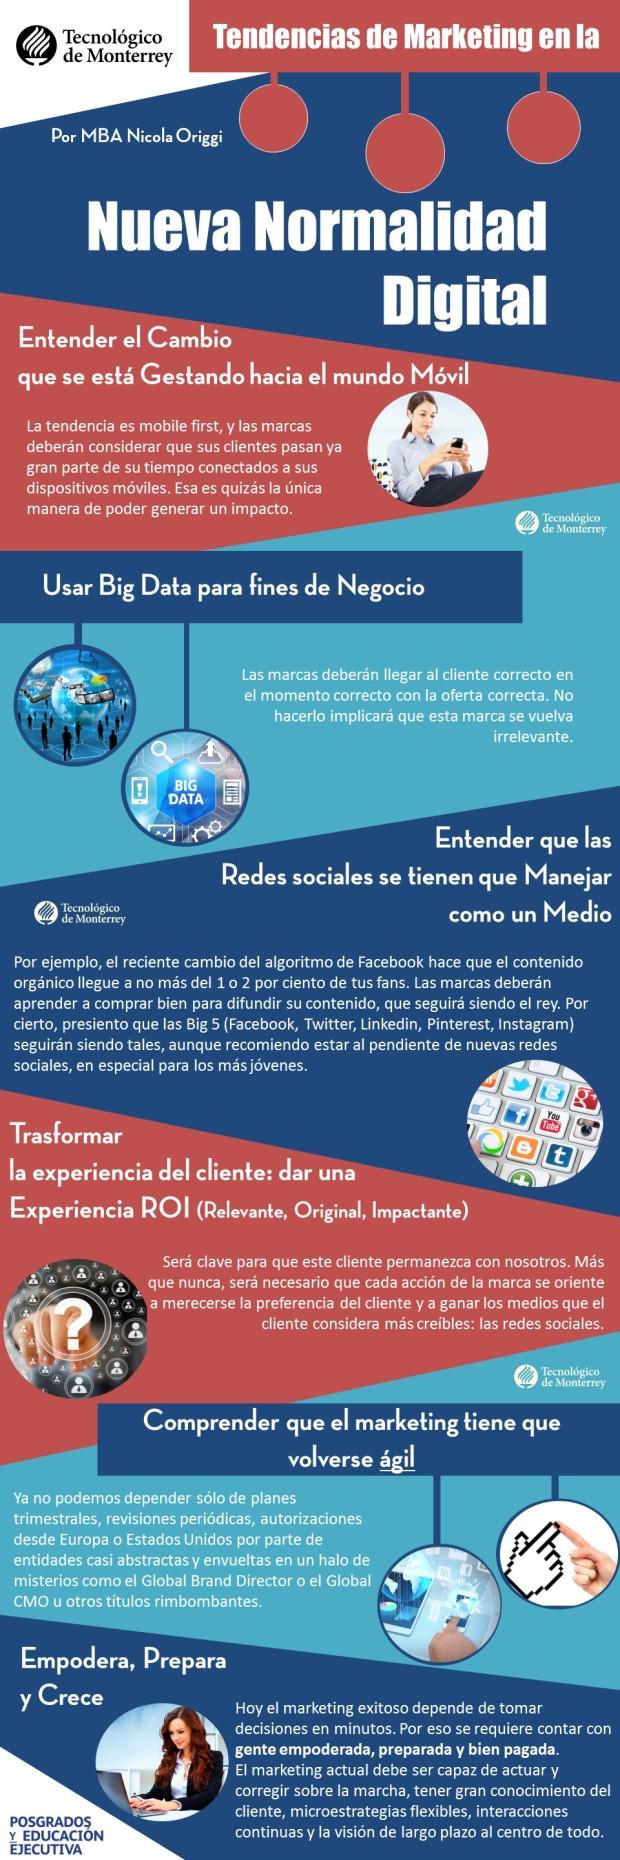 Infografia_MarketingDigital_Tec_blog